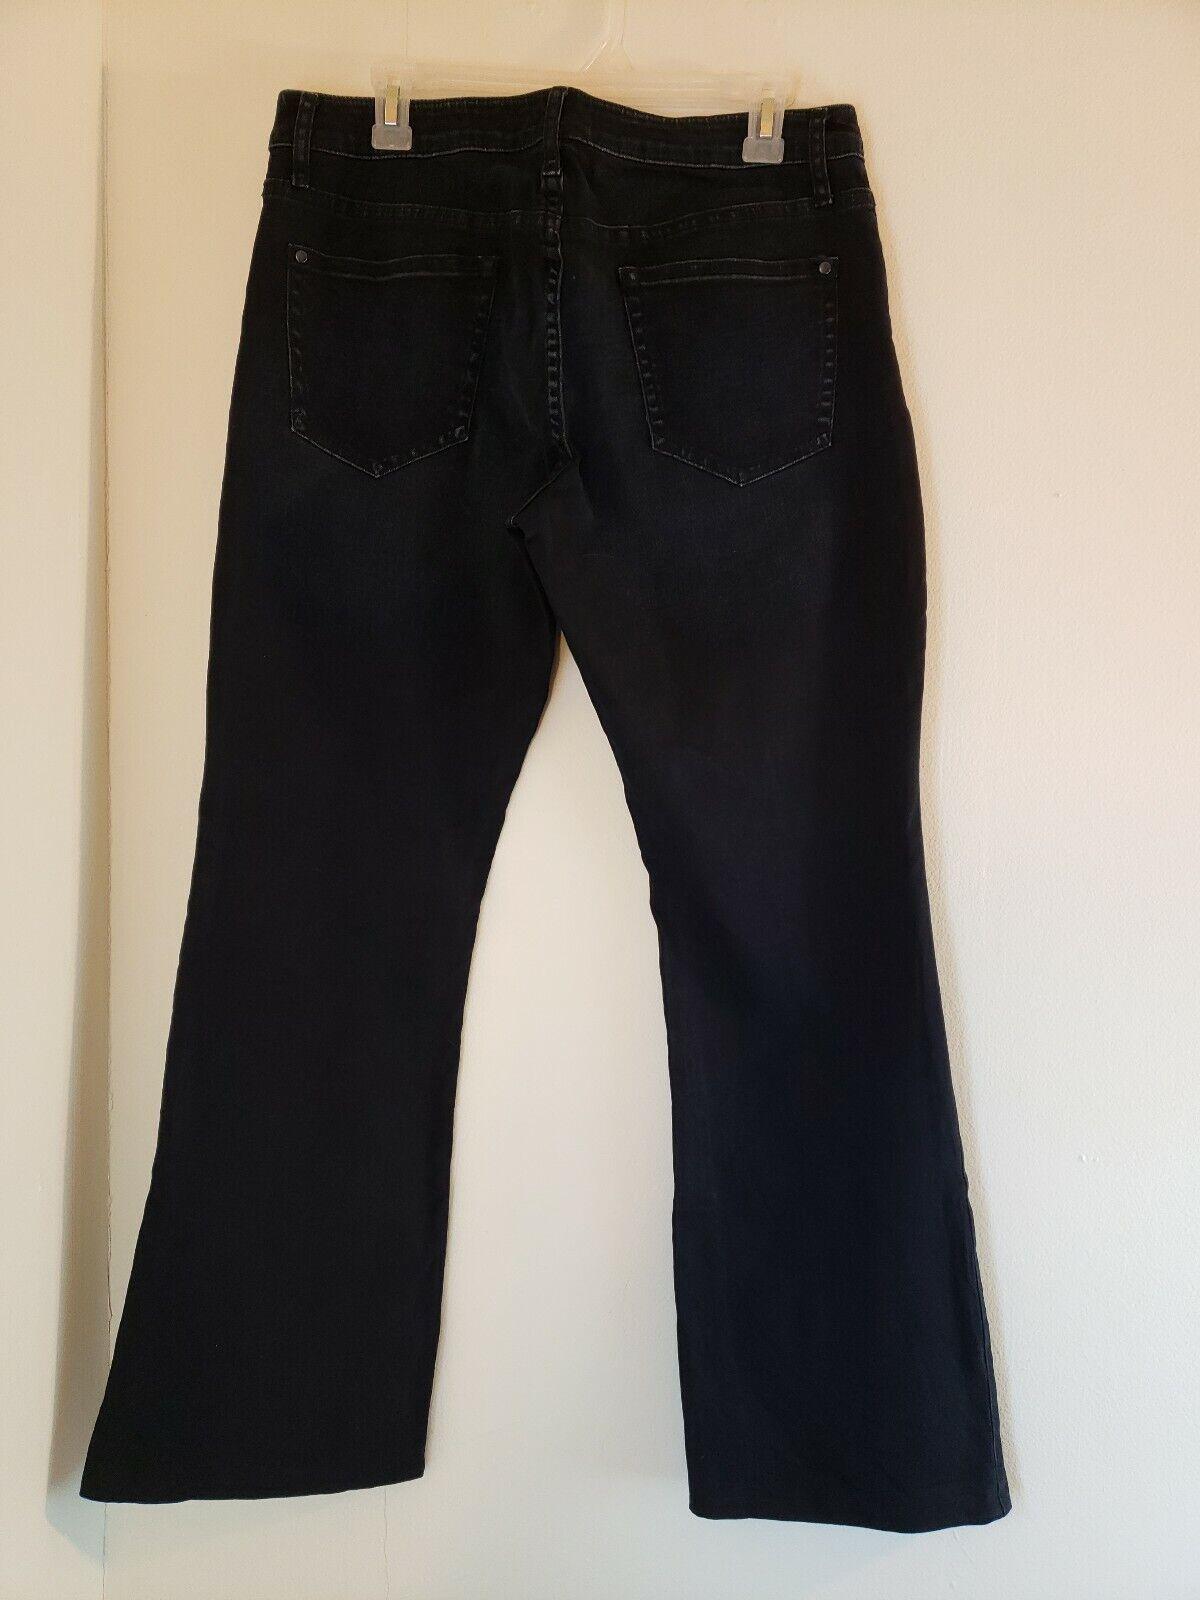 Pilcro and The Letterpress Anthropologie Denim bluee Jeans 32 Dark bluee Bootcut